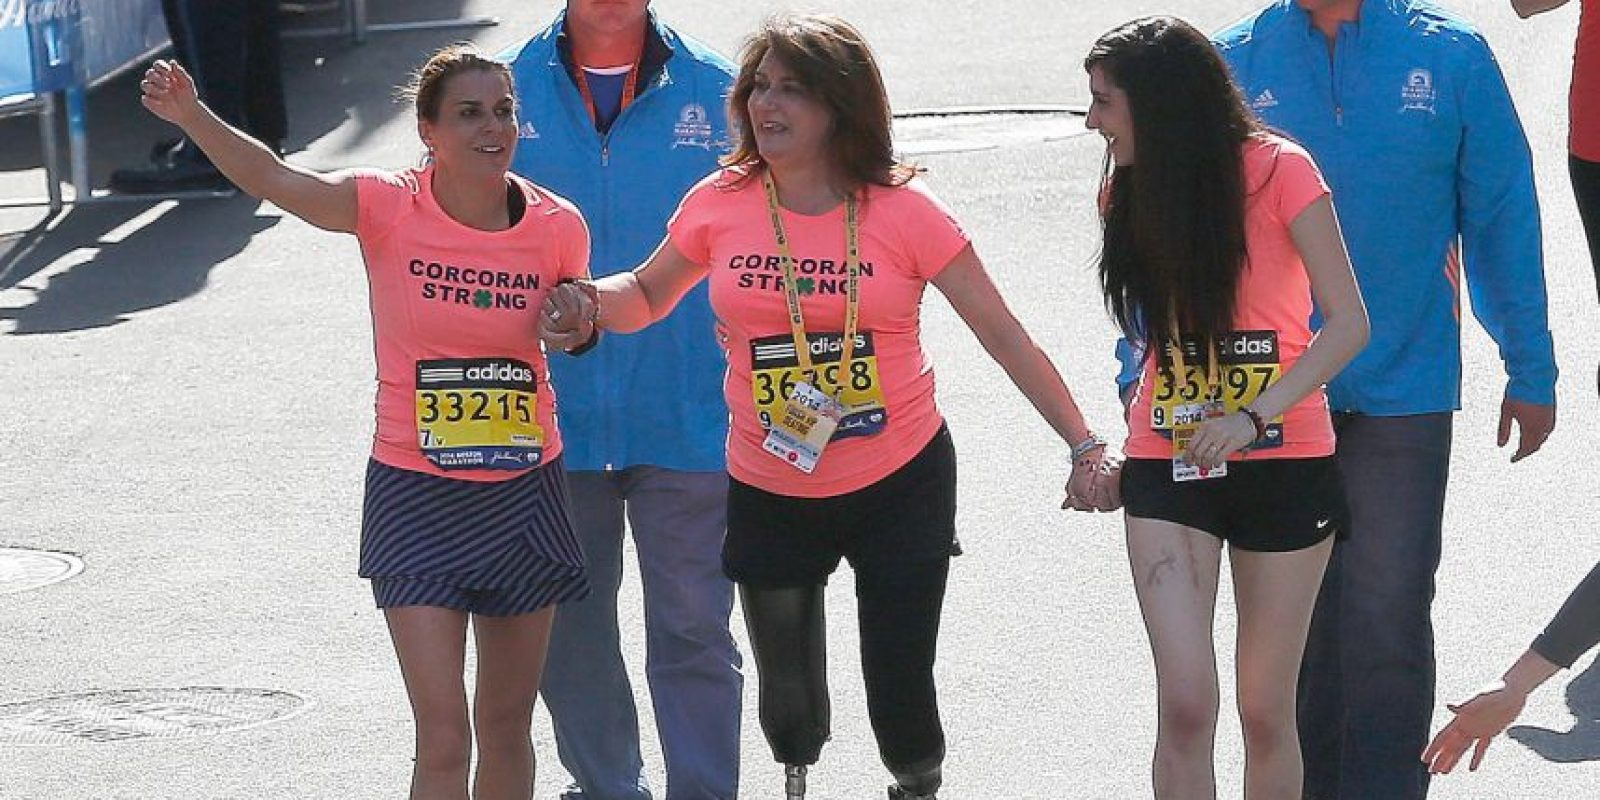 El primer maratón después de la tragedia: 21 de abril de 2014 Foto:Getty Images